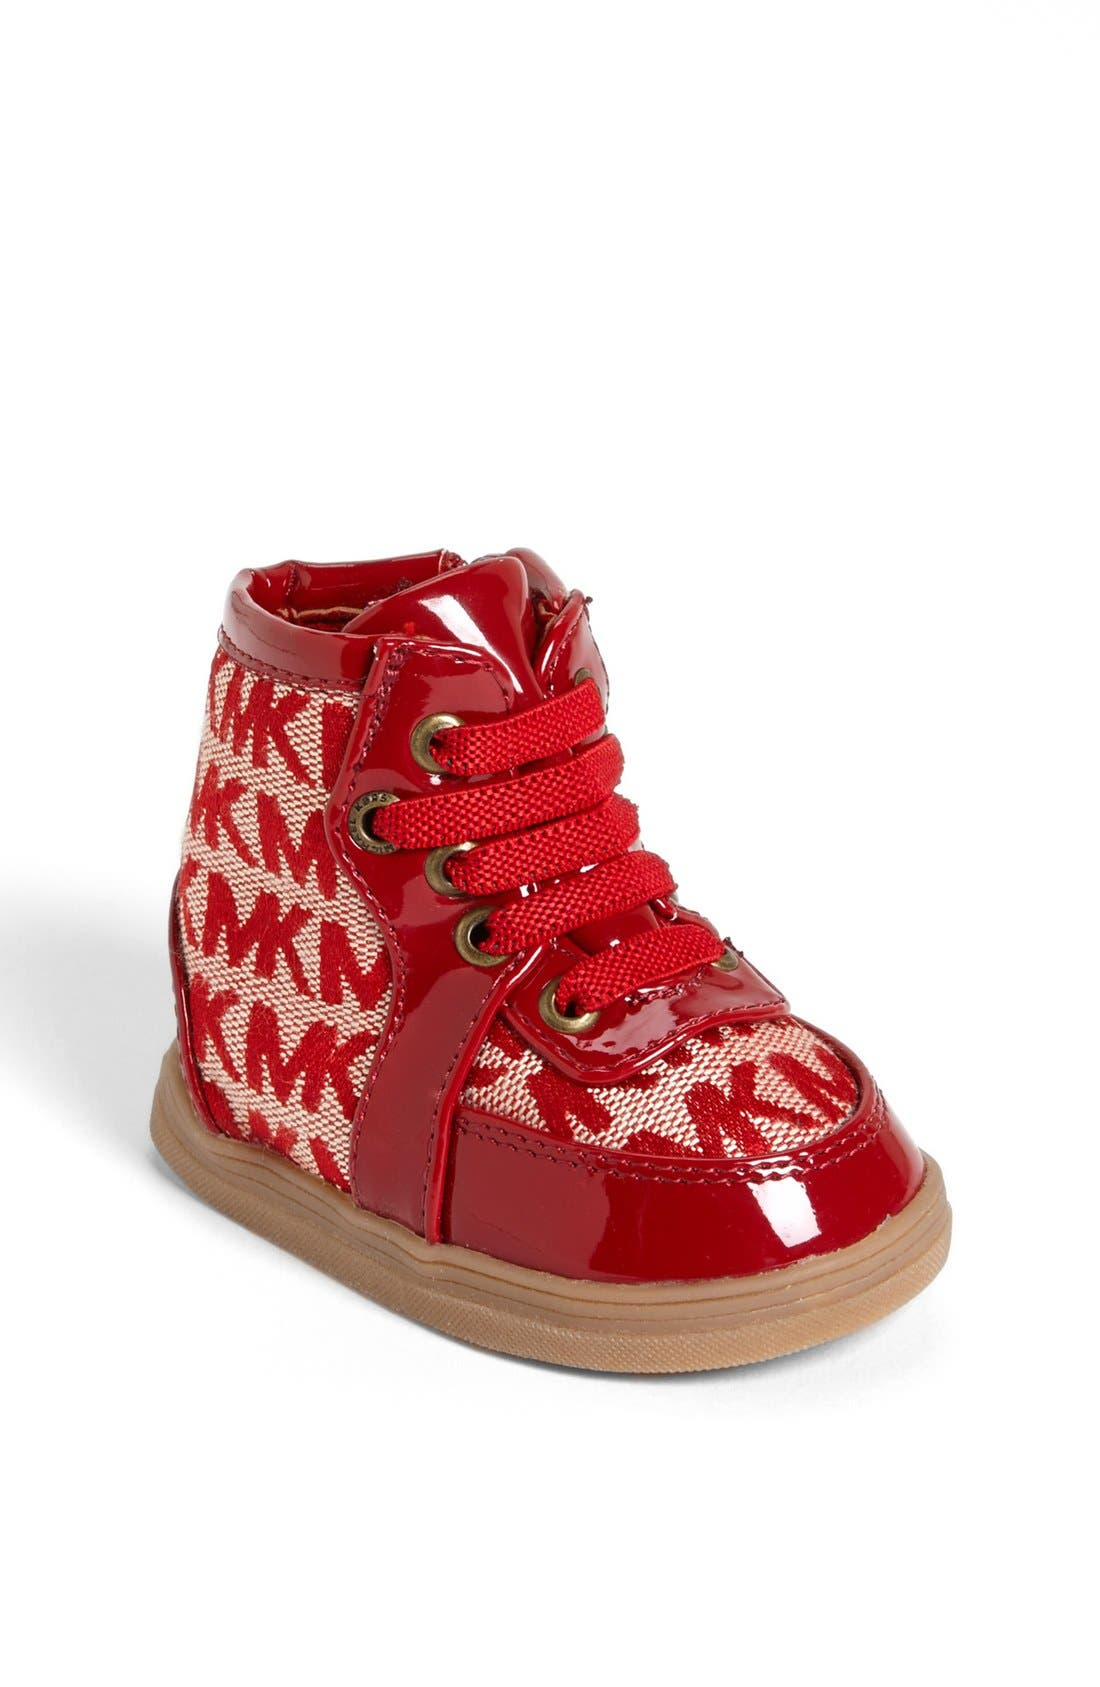 Main Image - MICHAEL Michael Kors 'Ivy' Crib Shoe (Baby)